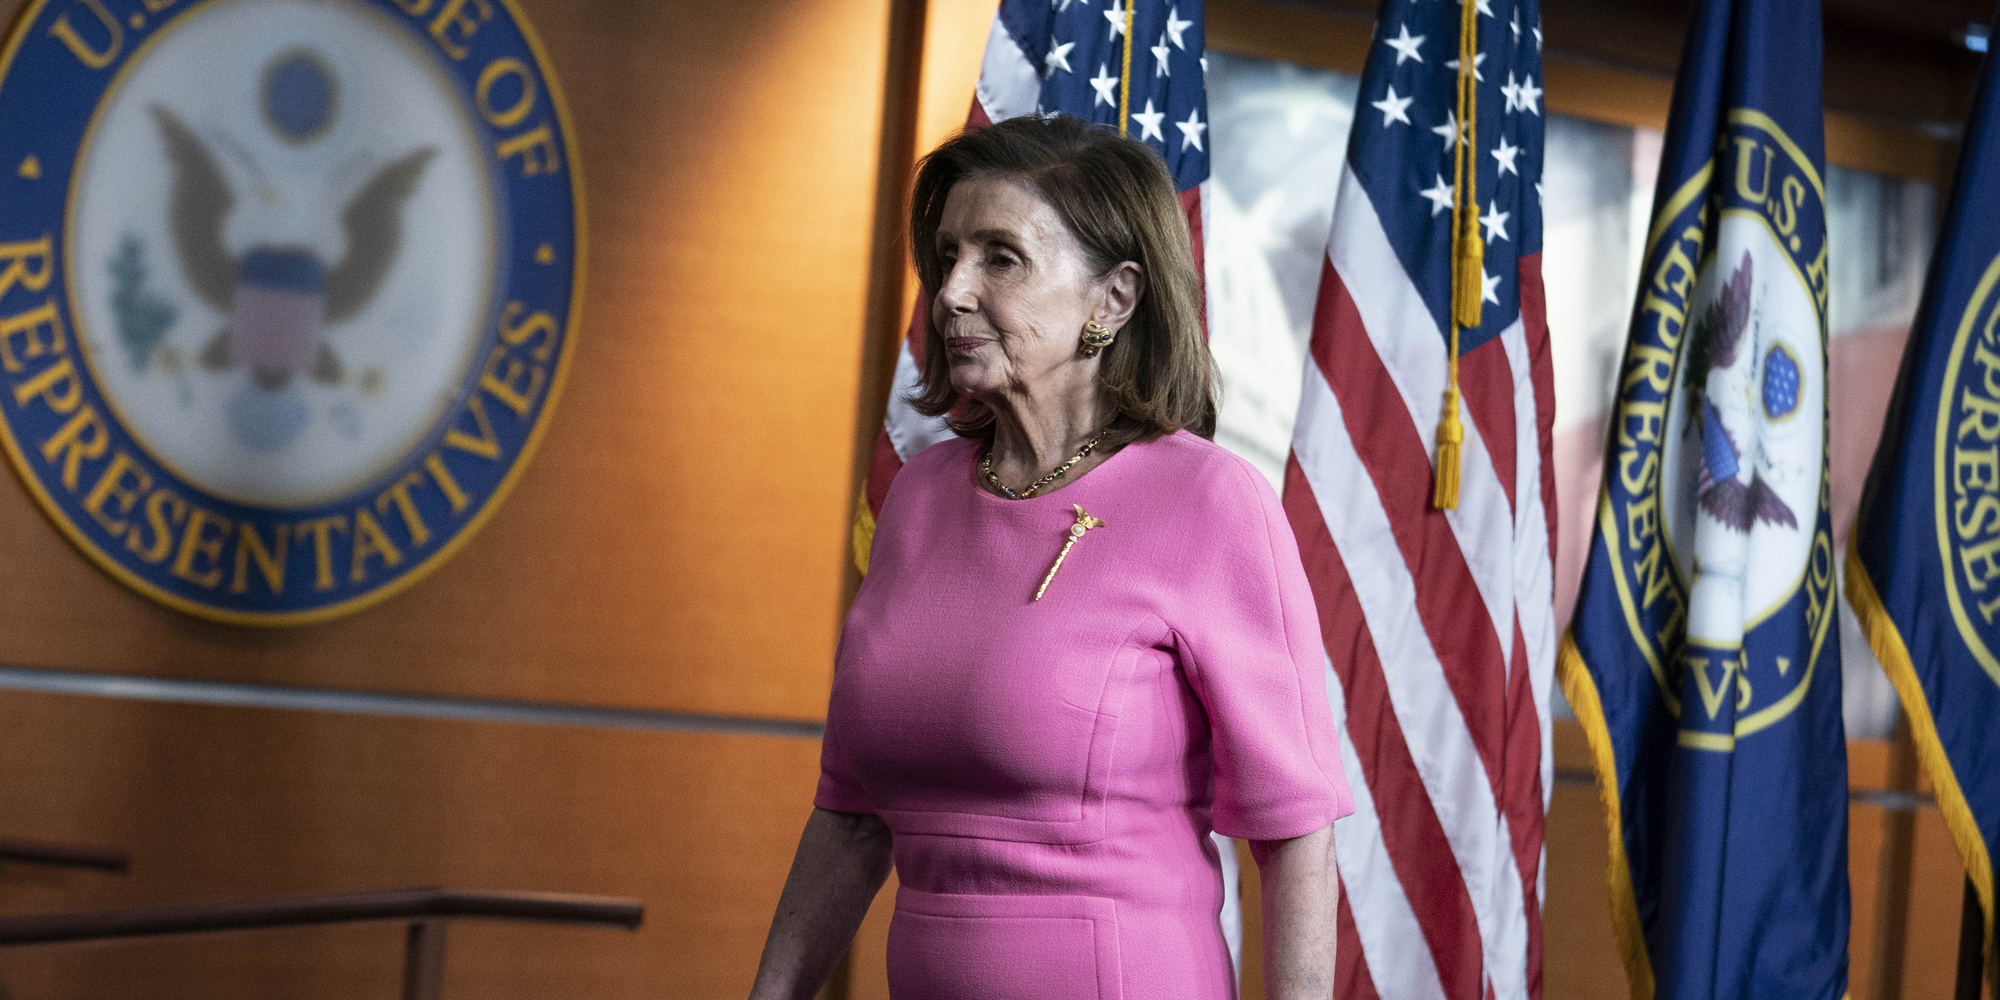 Nancy Pelosi Delays Infrastructure Vote After Progressive Pressure